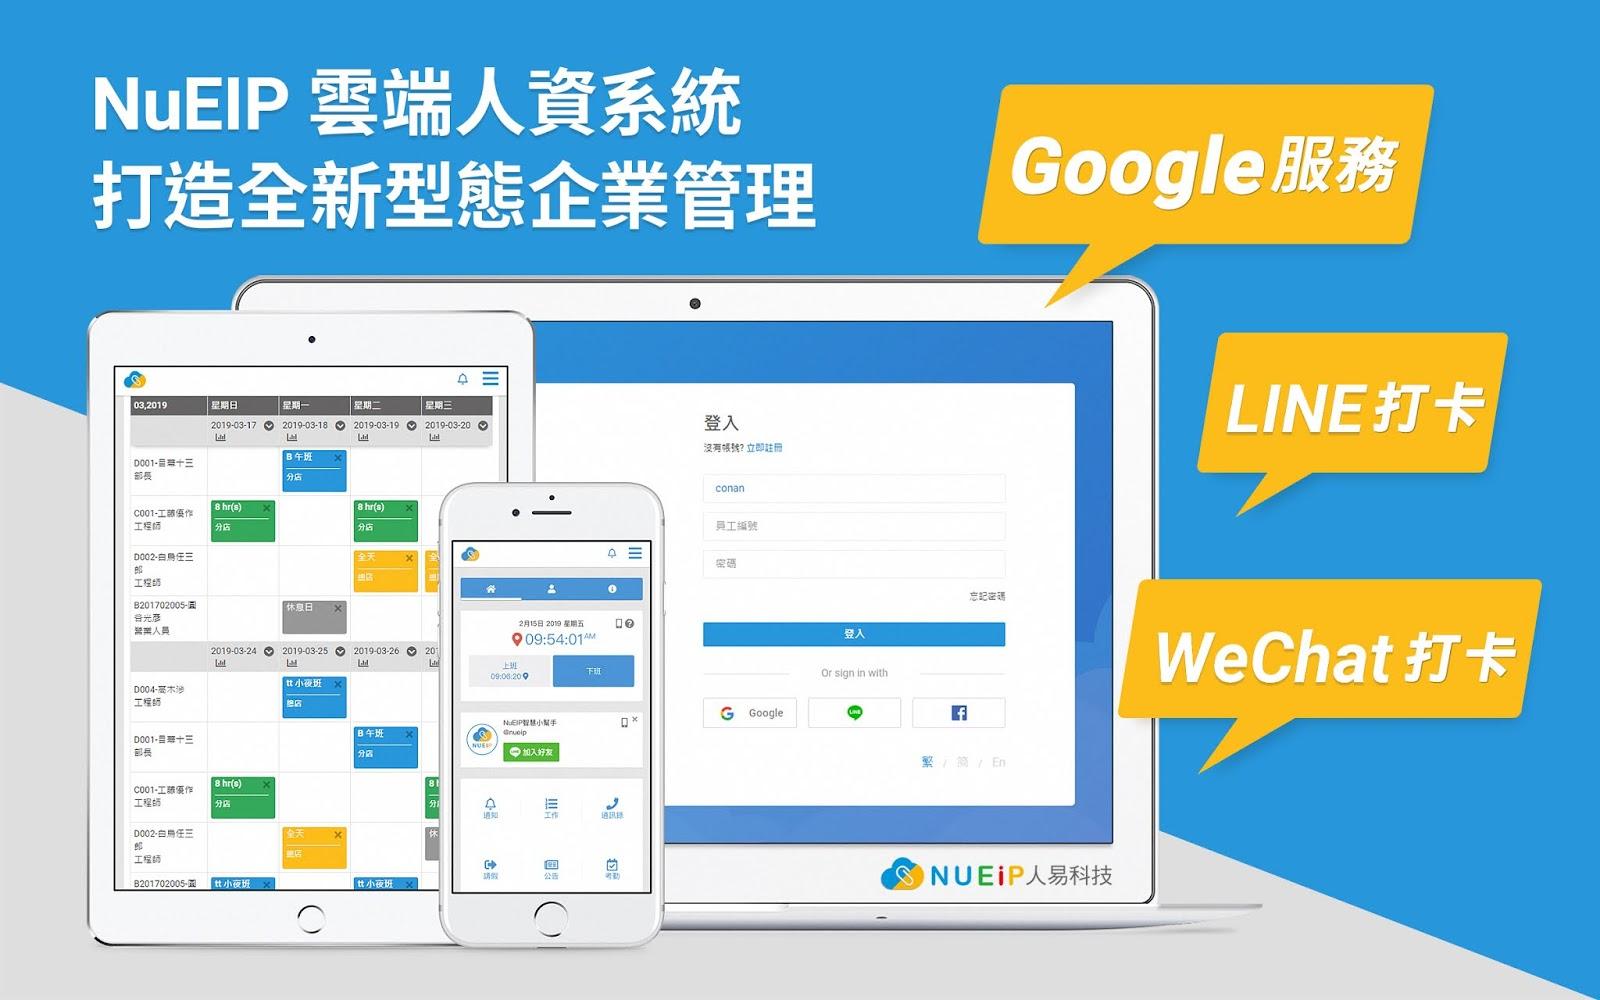 NuEIP雲端人資系統。打造全新型態企業管理 ~ NuEIP 最新消息